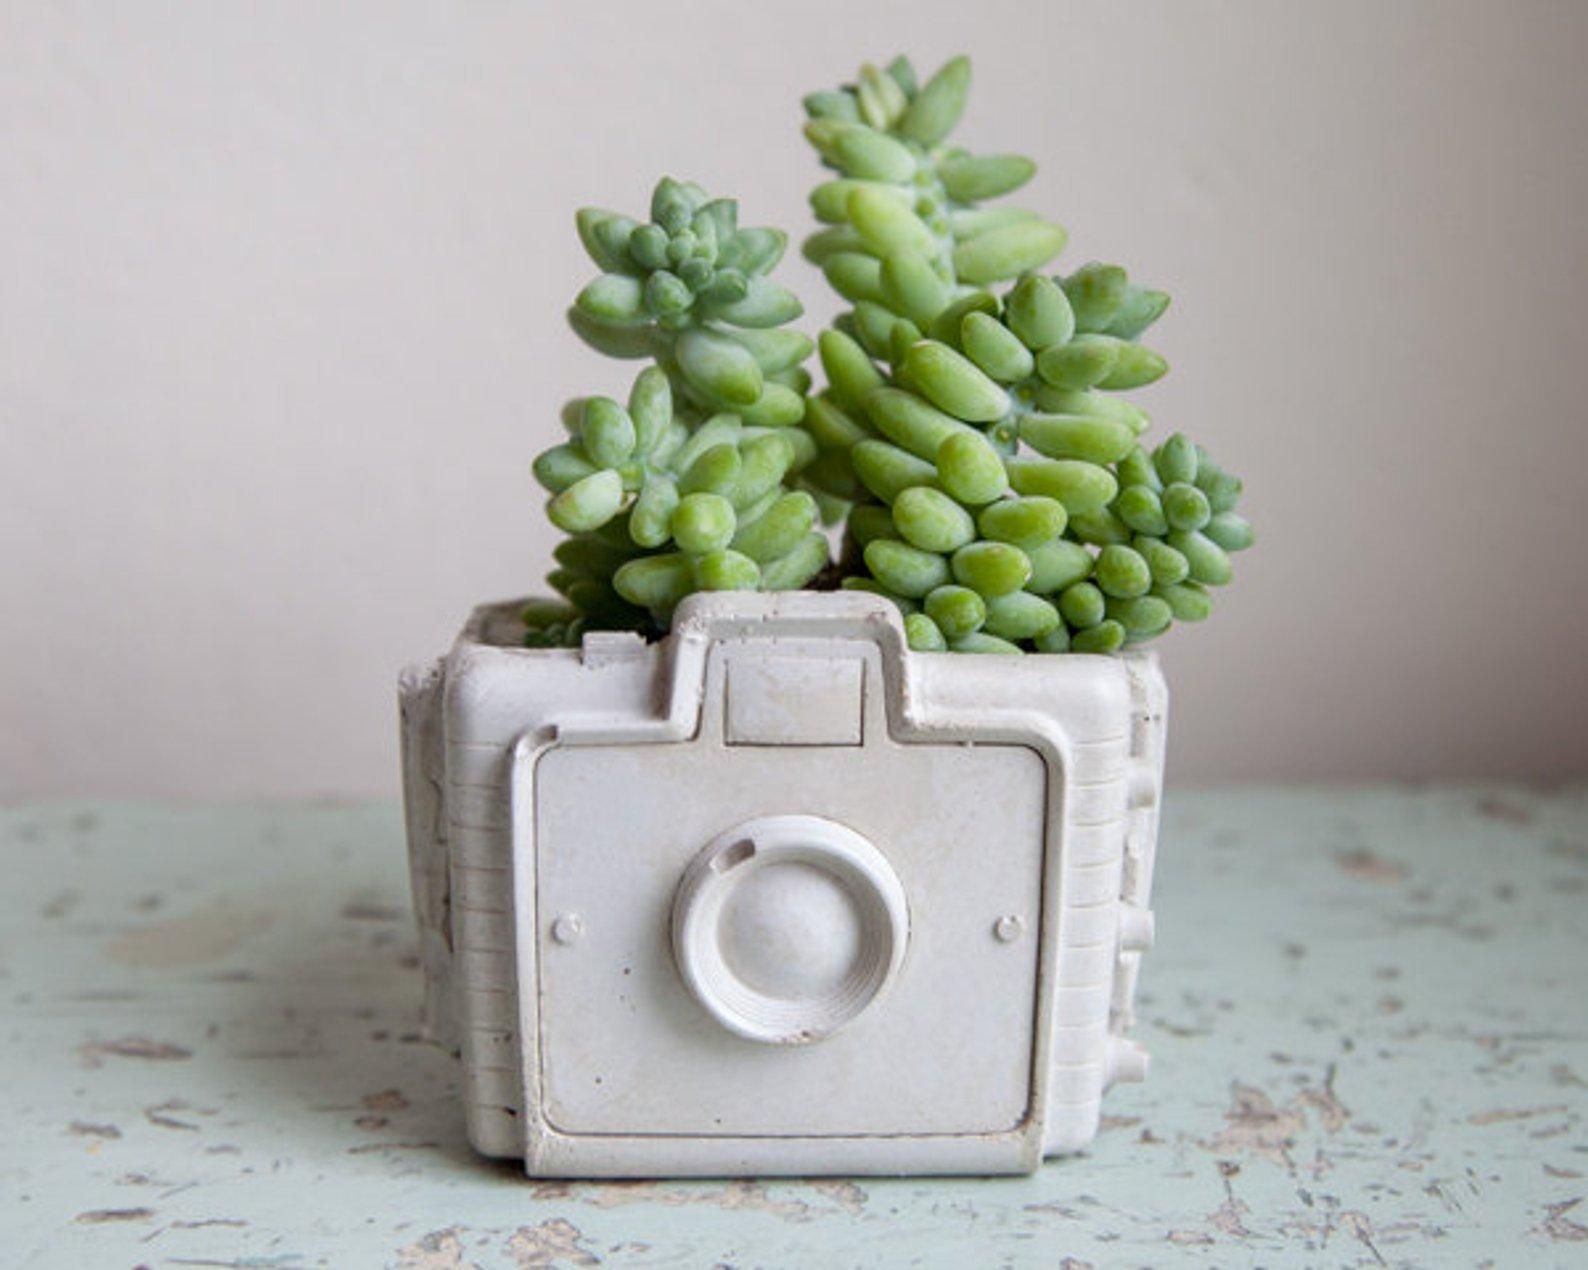 Camera Planter By Brooklyn Global